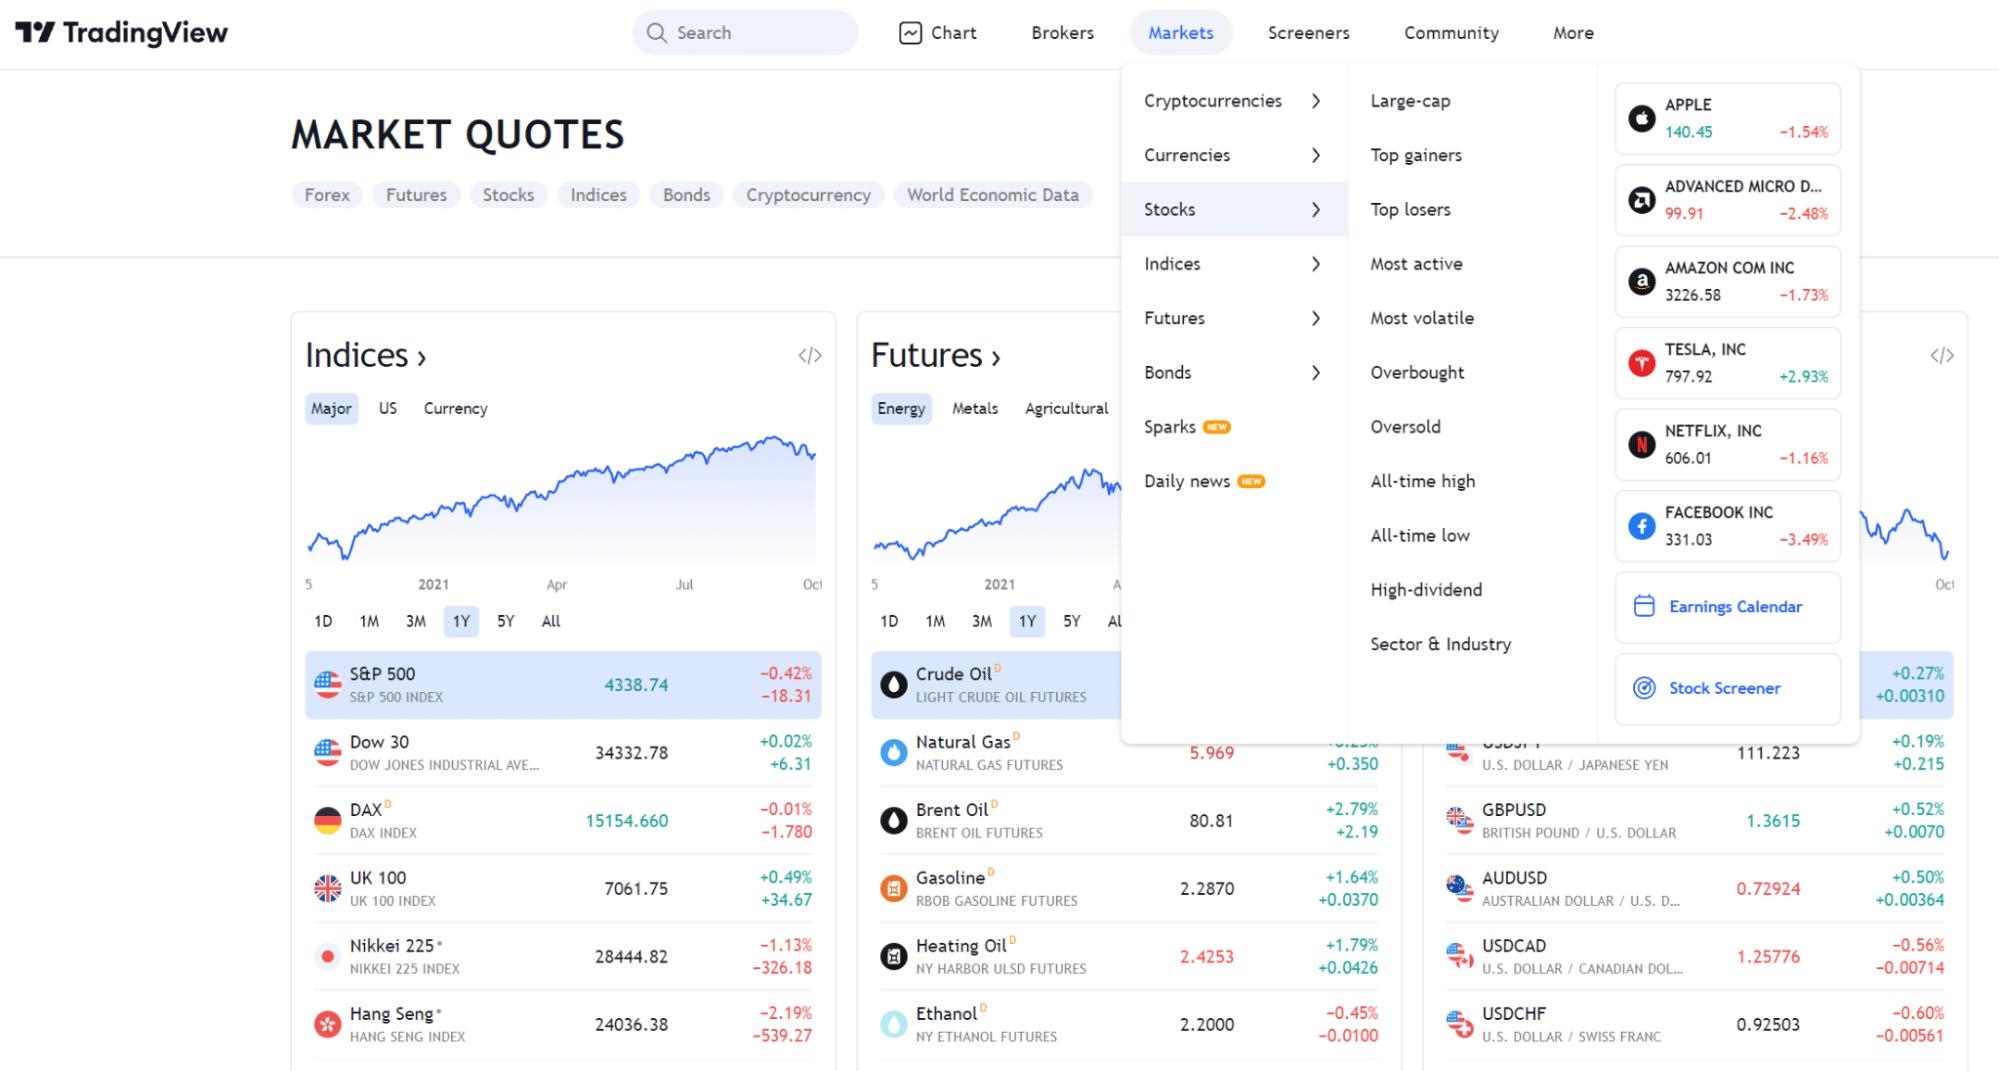 Image showing TradingView robust indicators